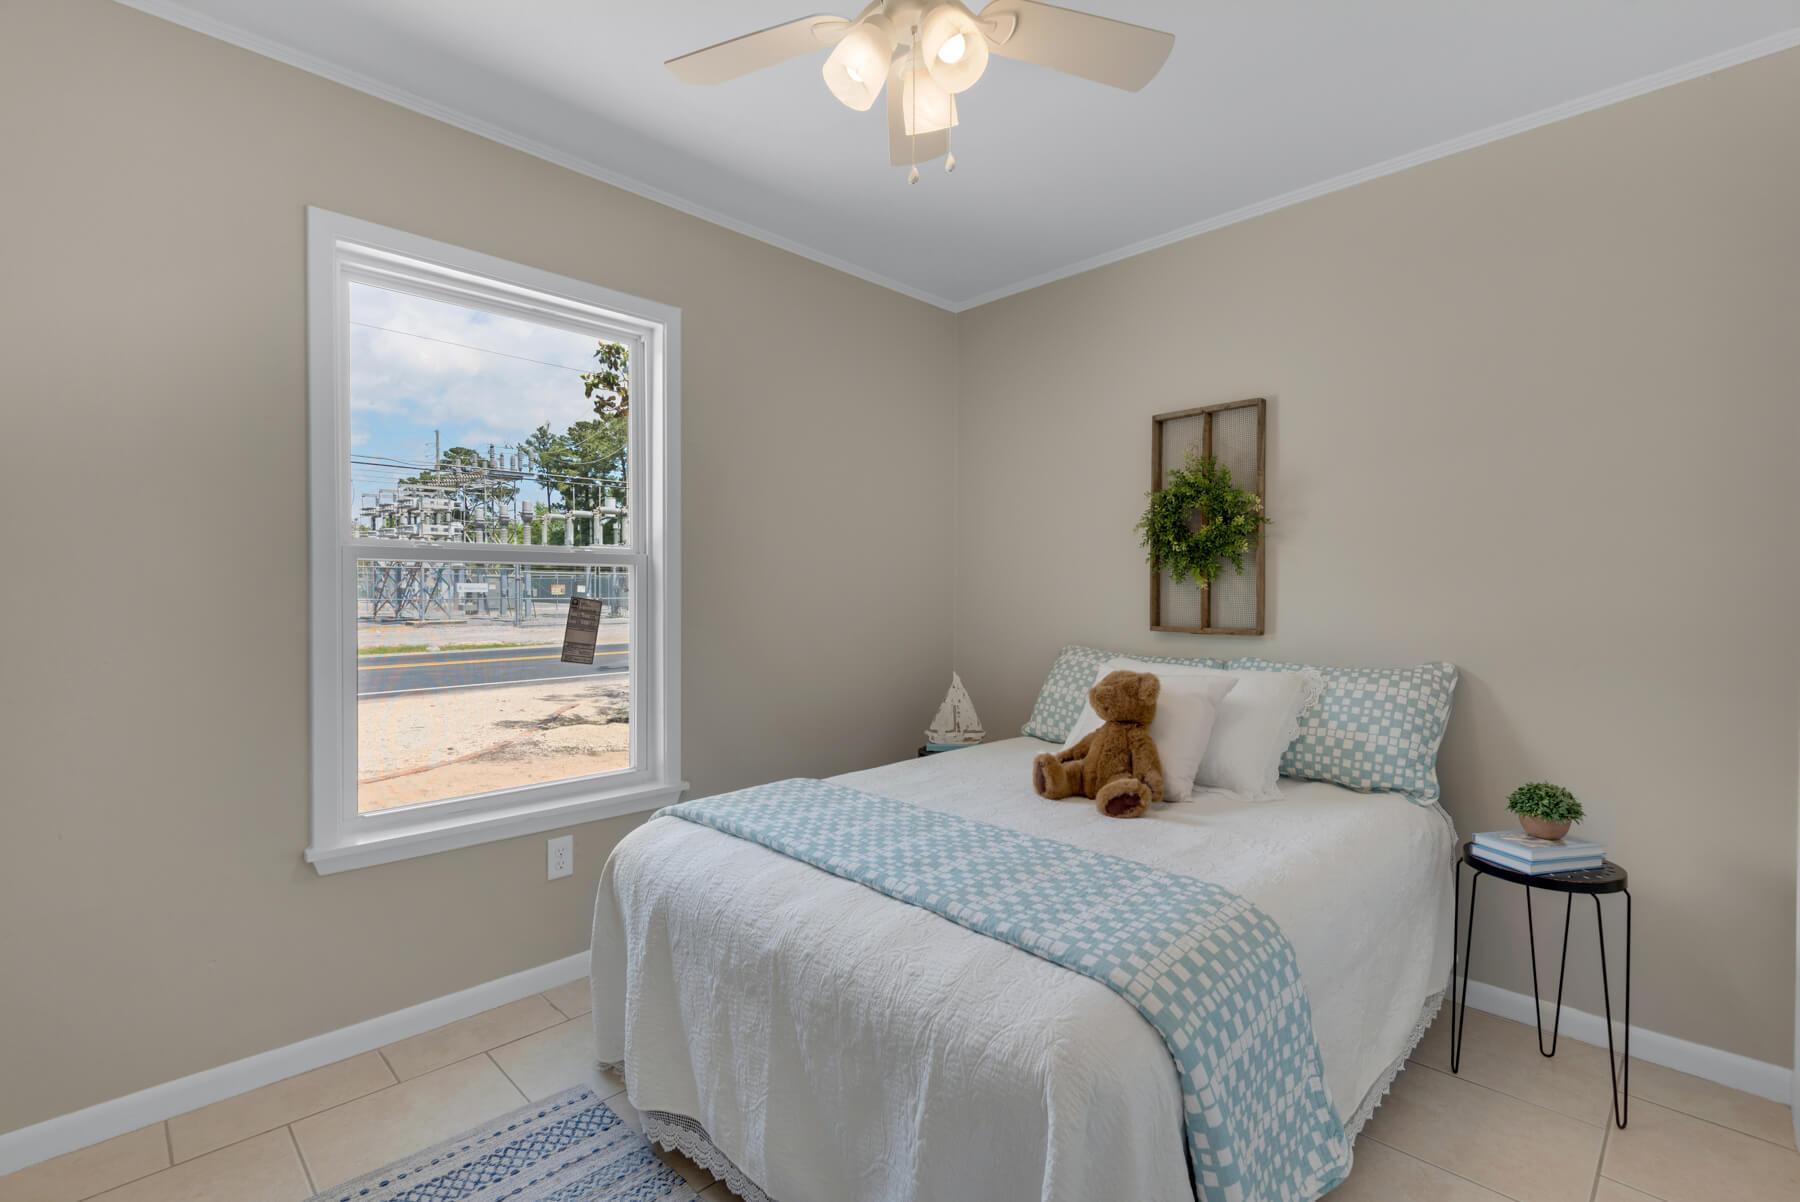 7466 Twin Beech Road Fairhope for Sale Urban Property bedroom view 4